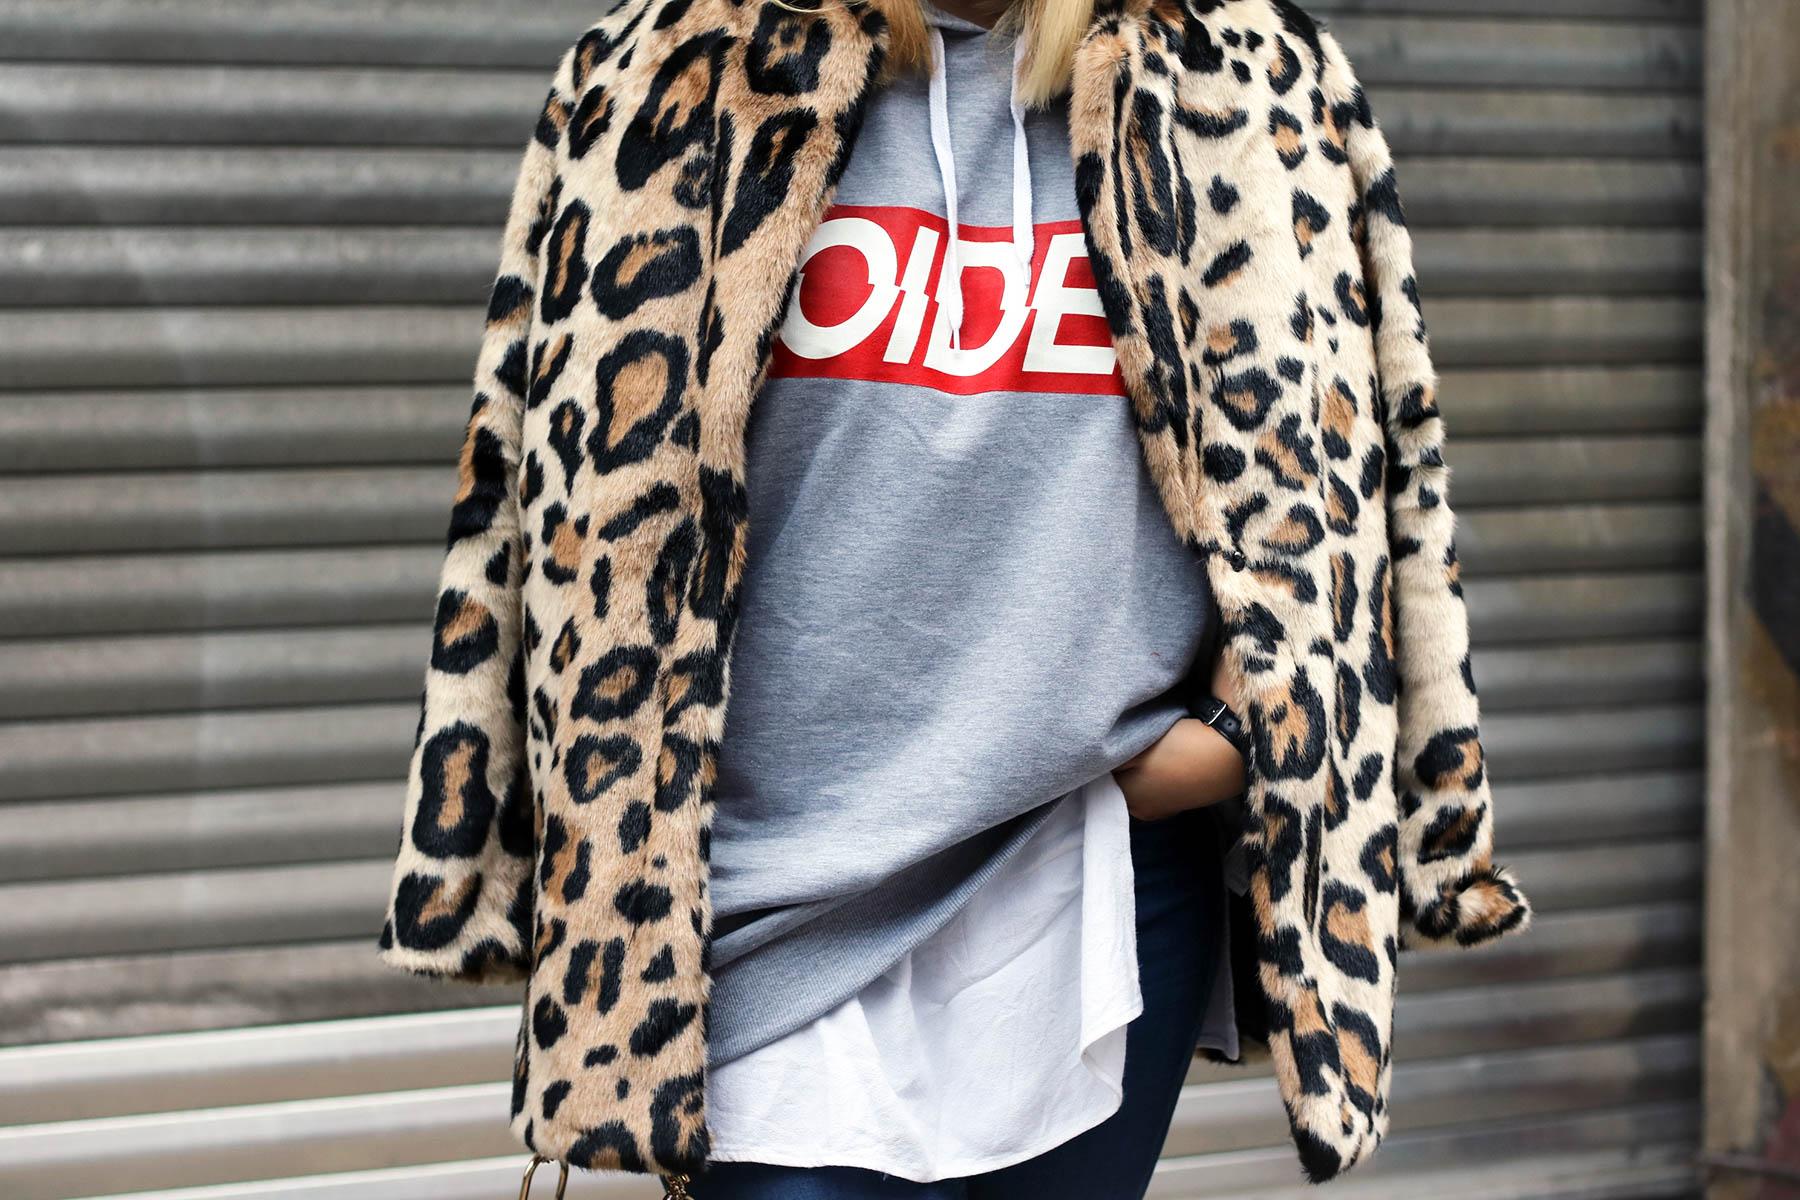 outfit-modeblog-fashionblog-fashionpassionlove-leo-mantel-trend-mantel-winter-sneaker-adidas31 (1 von 1)